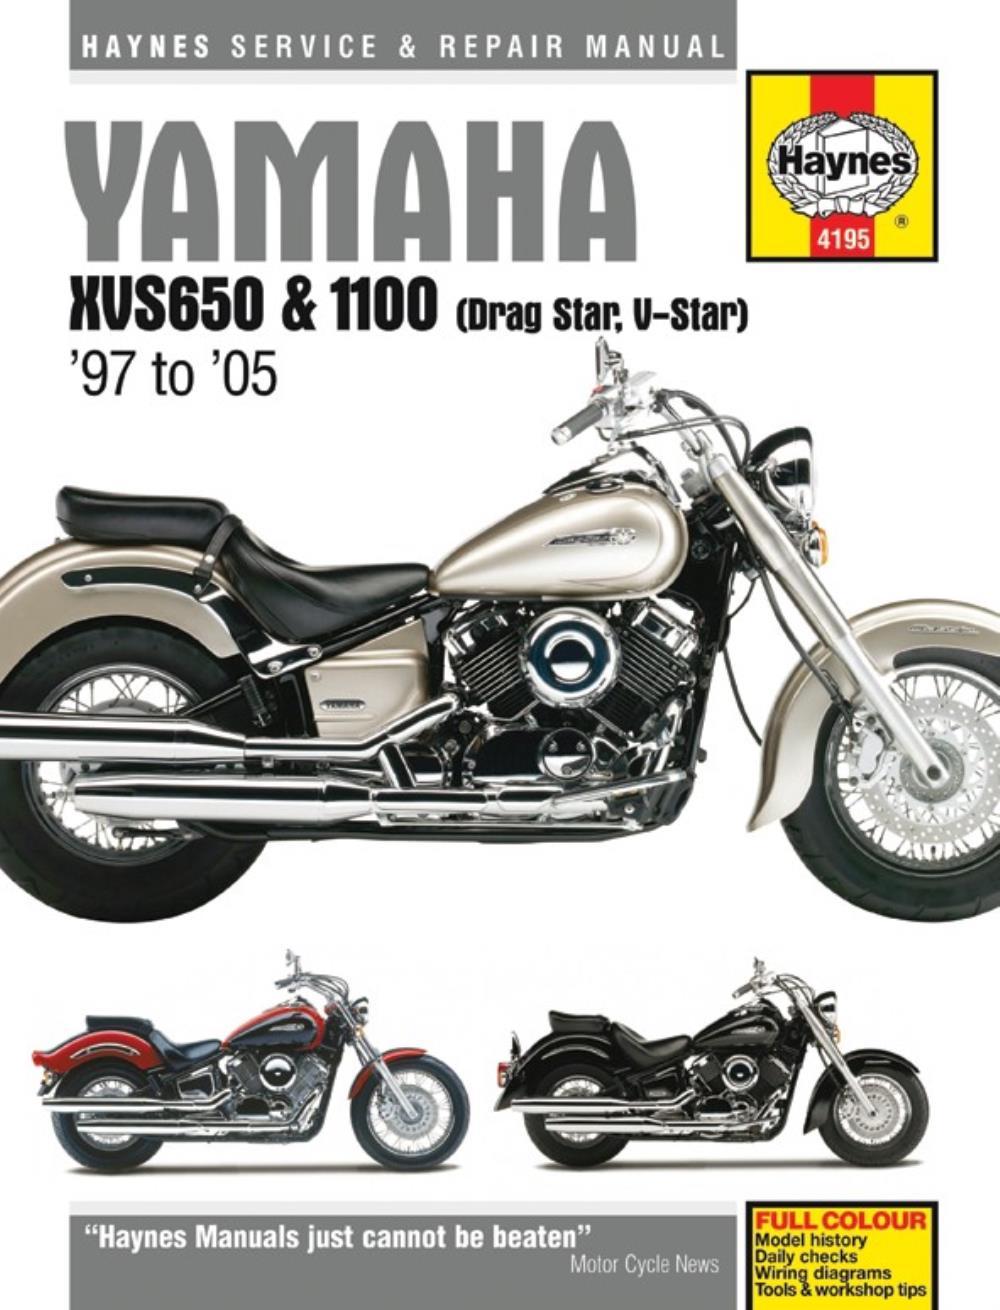 medium resolution of image is loading manual haynes for 2002 yamaha xvs 1100 a